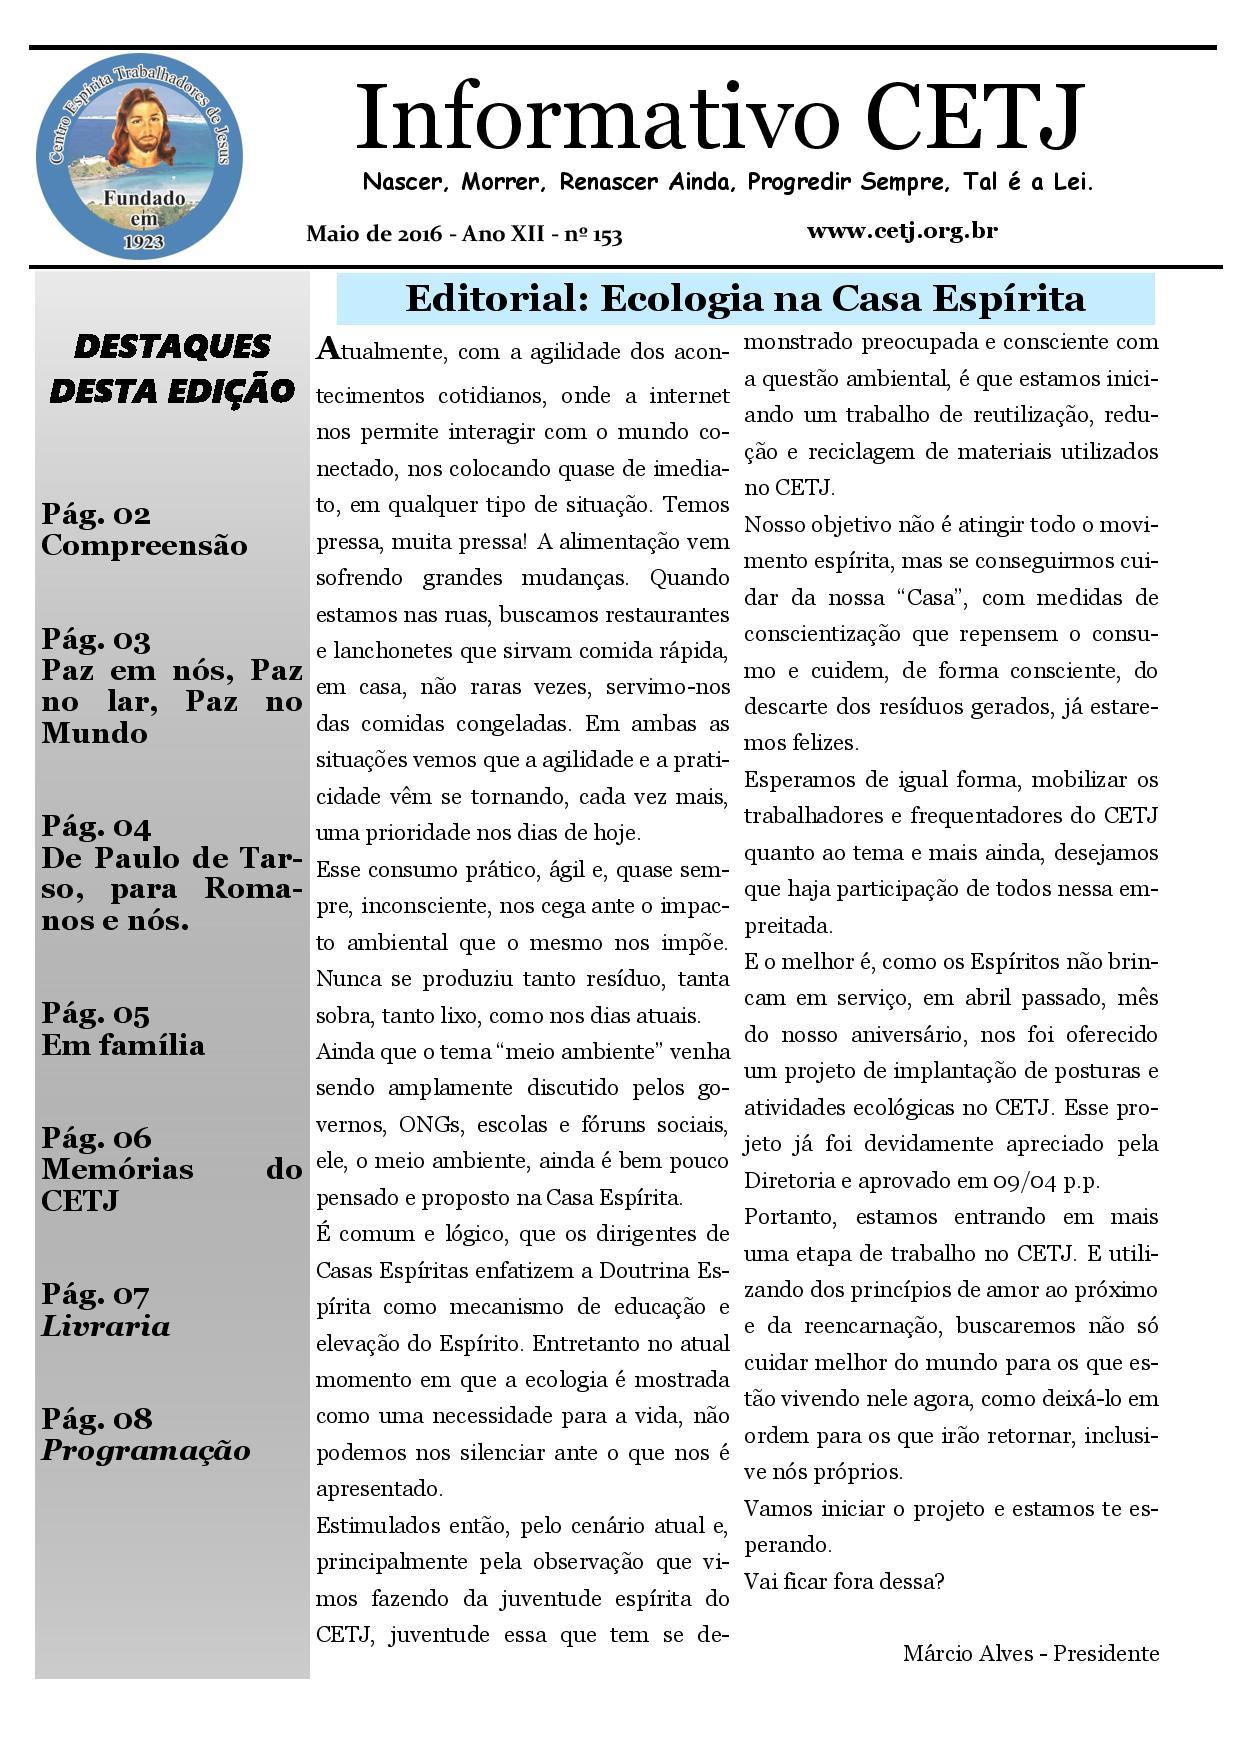 Informativo maio de 2016_net-page-001